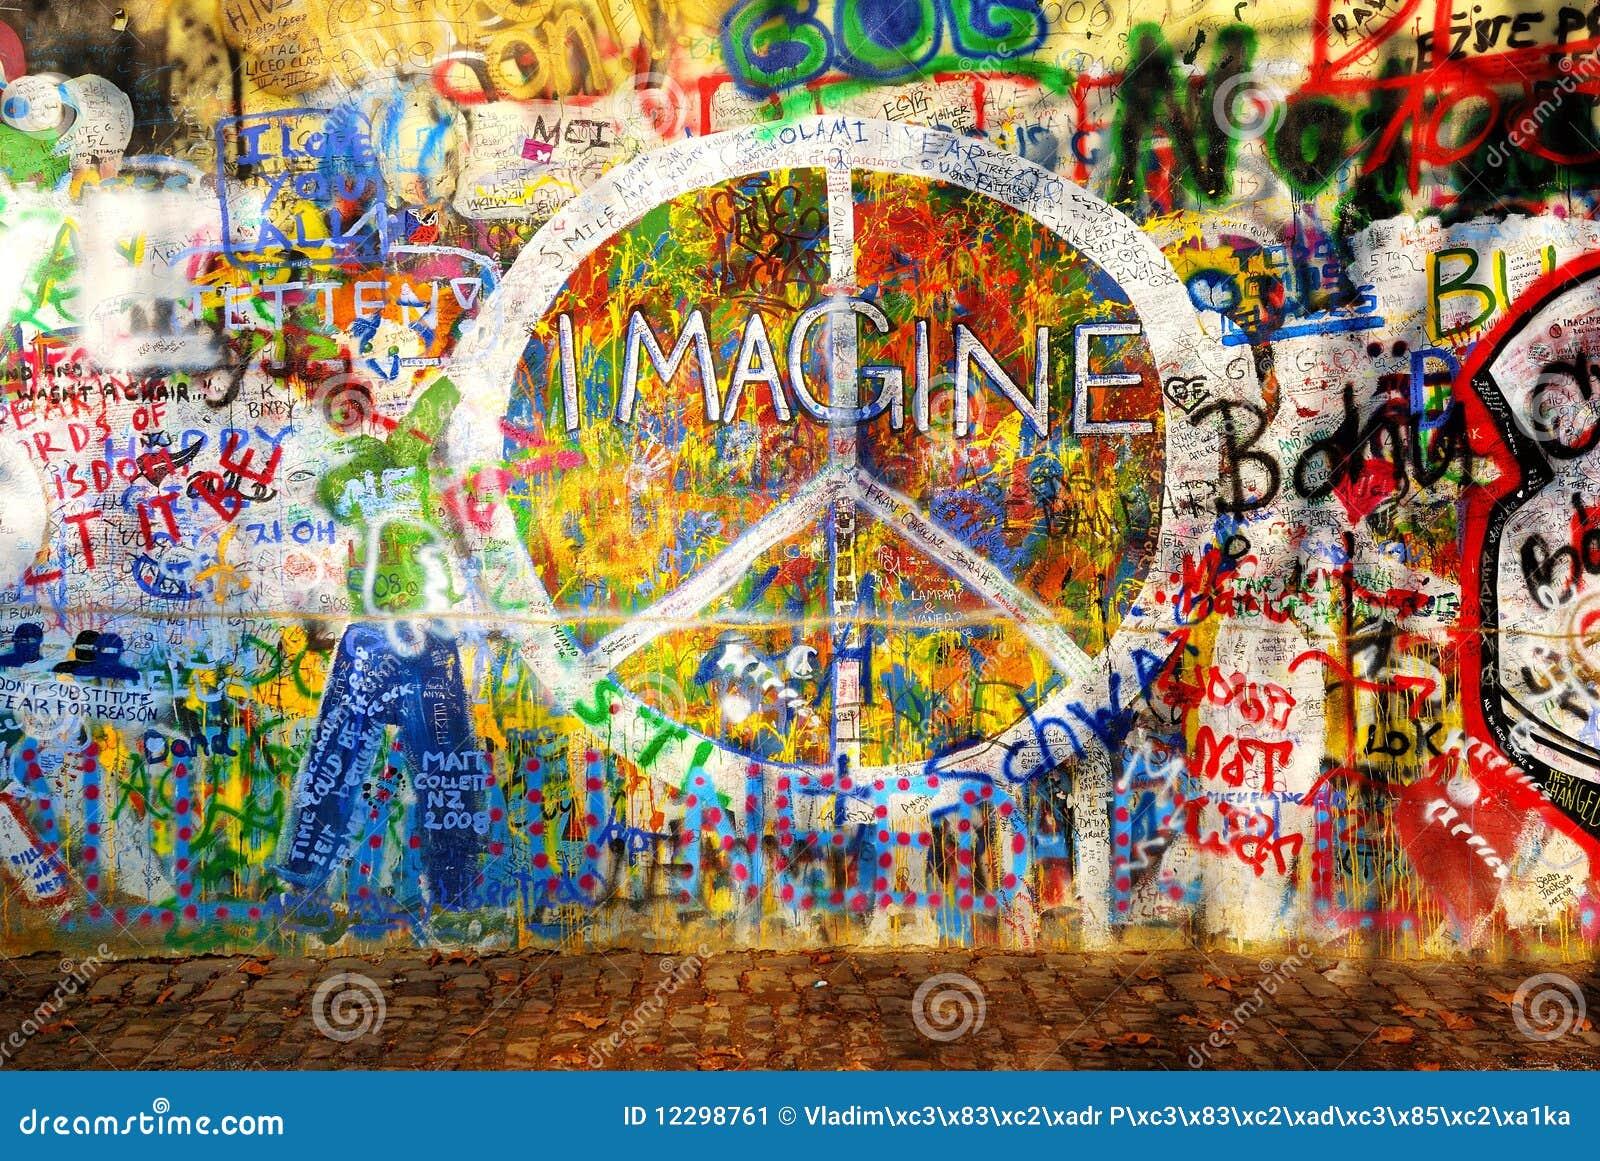 Imagine a parede